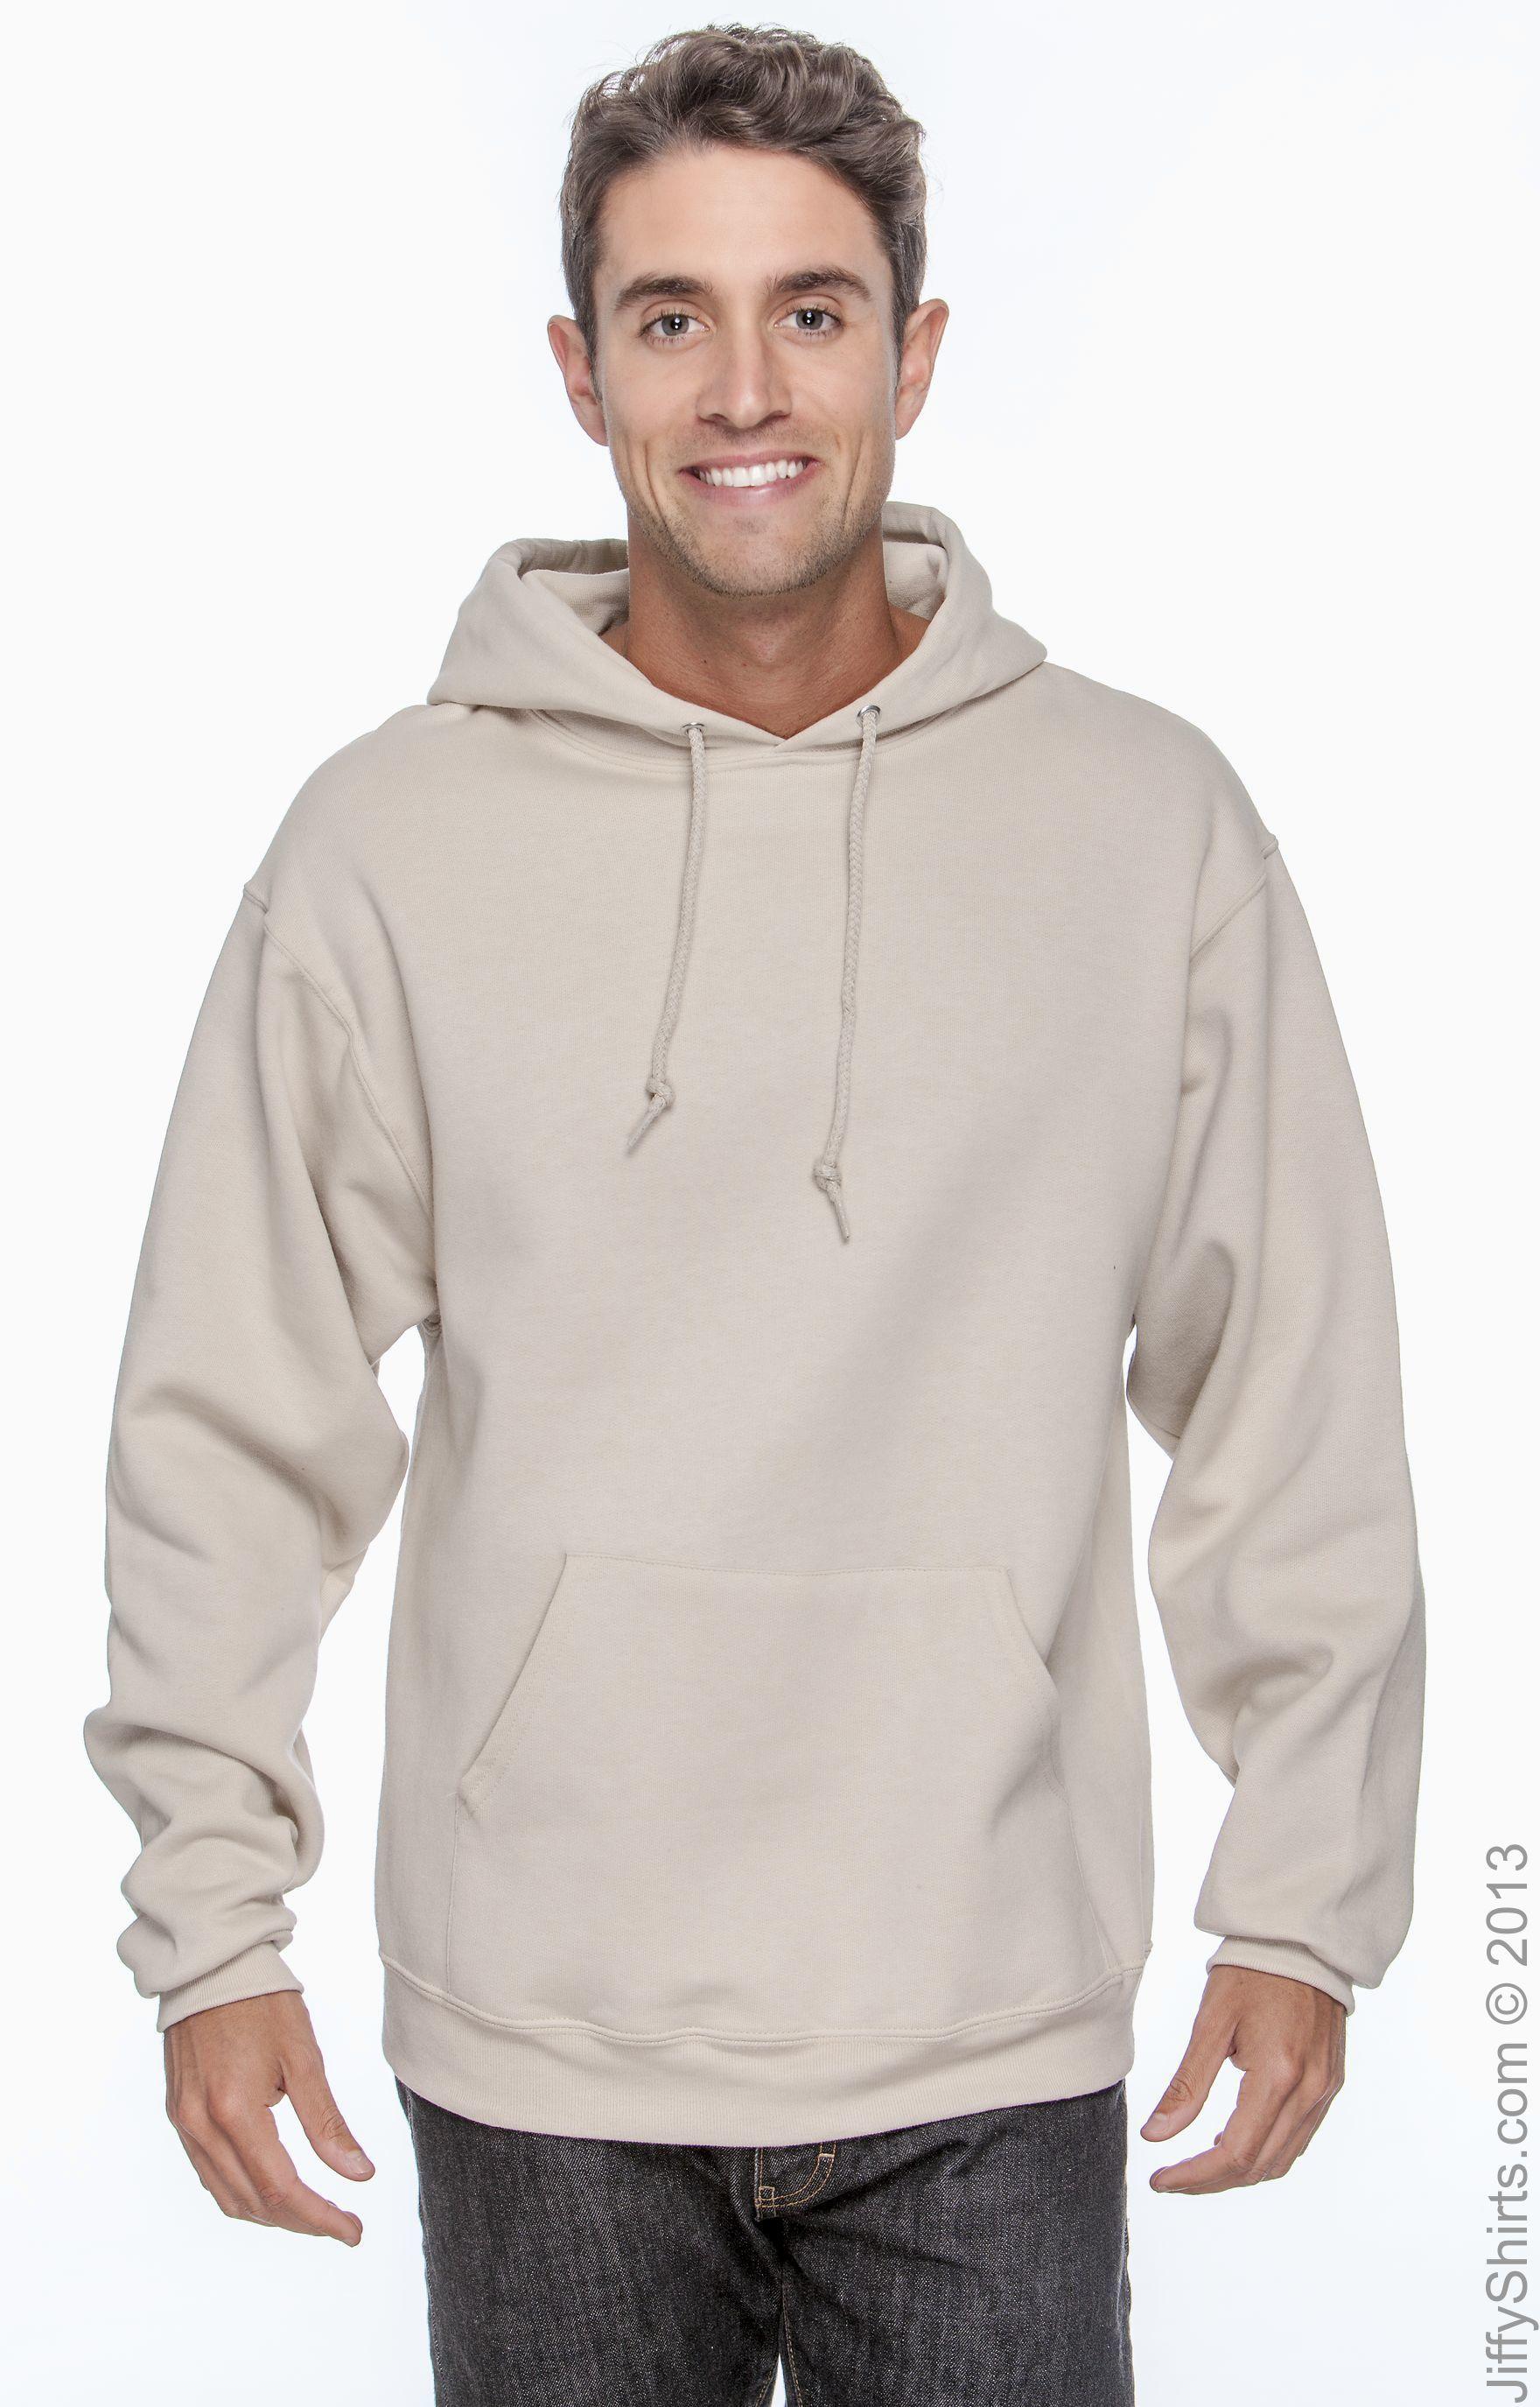 JERZEES Men/'s Hoodie Fleece Pullover Hooded Sweatshirt NuBlend Size 4XL-5XL New